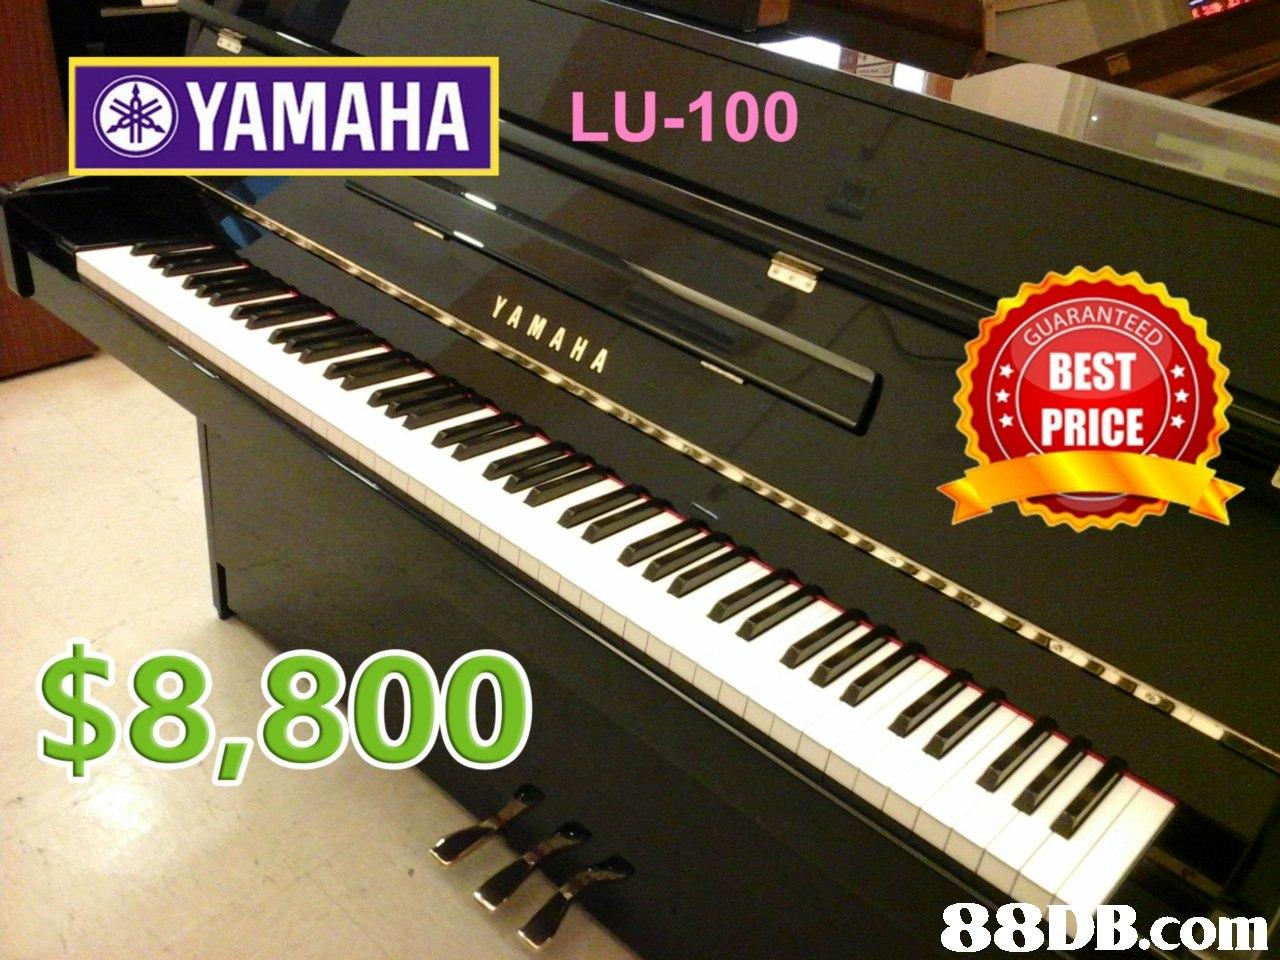 YAMAHA LU-100 ARANT YA MAHA BEST PRICE $8,800,musical instrument,piano,digital piano,keyboard,technology